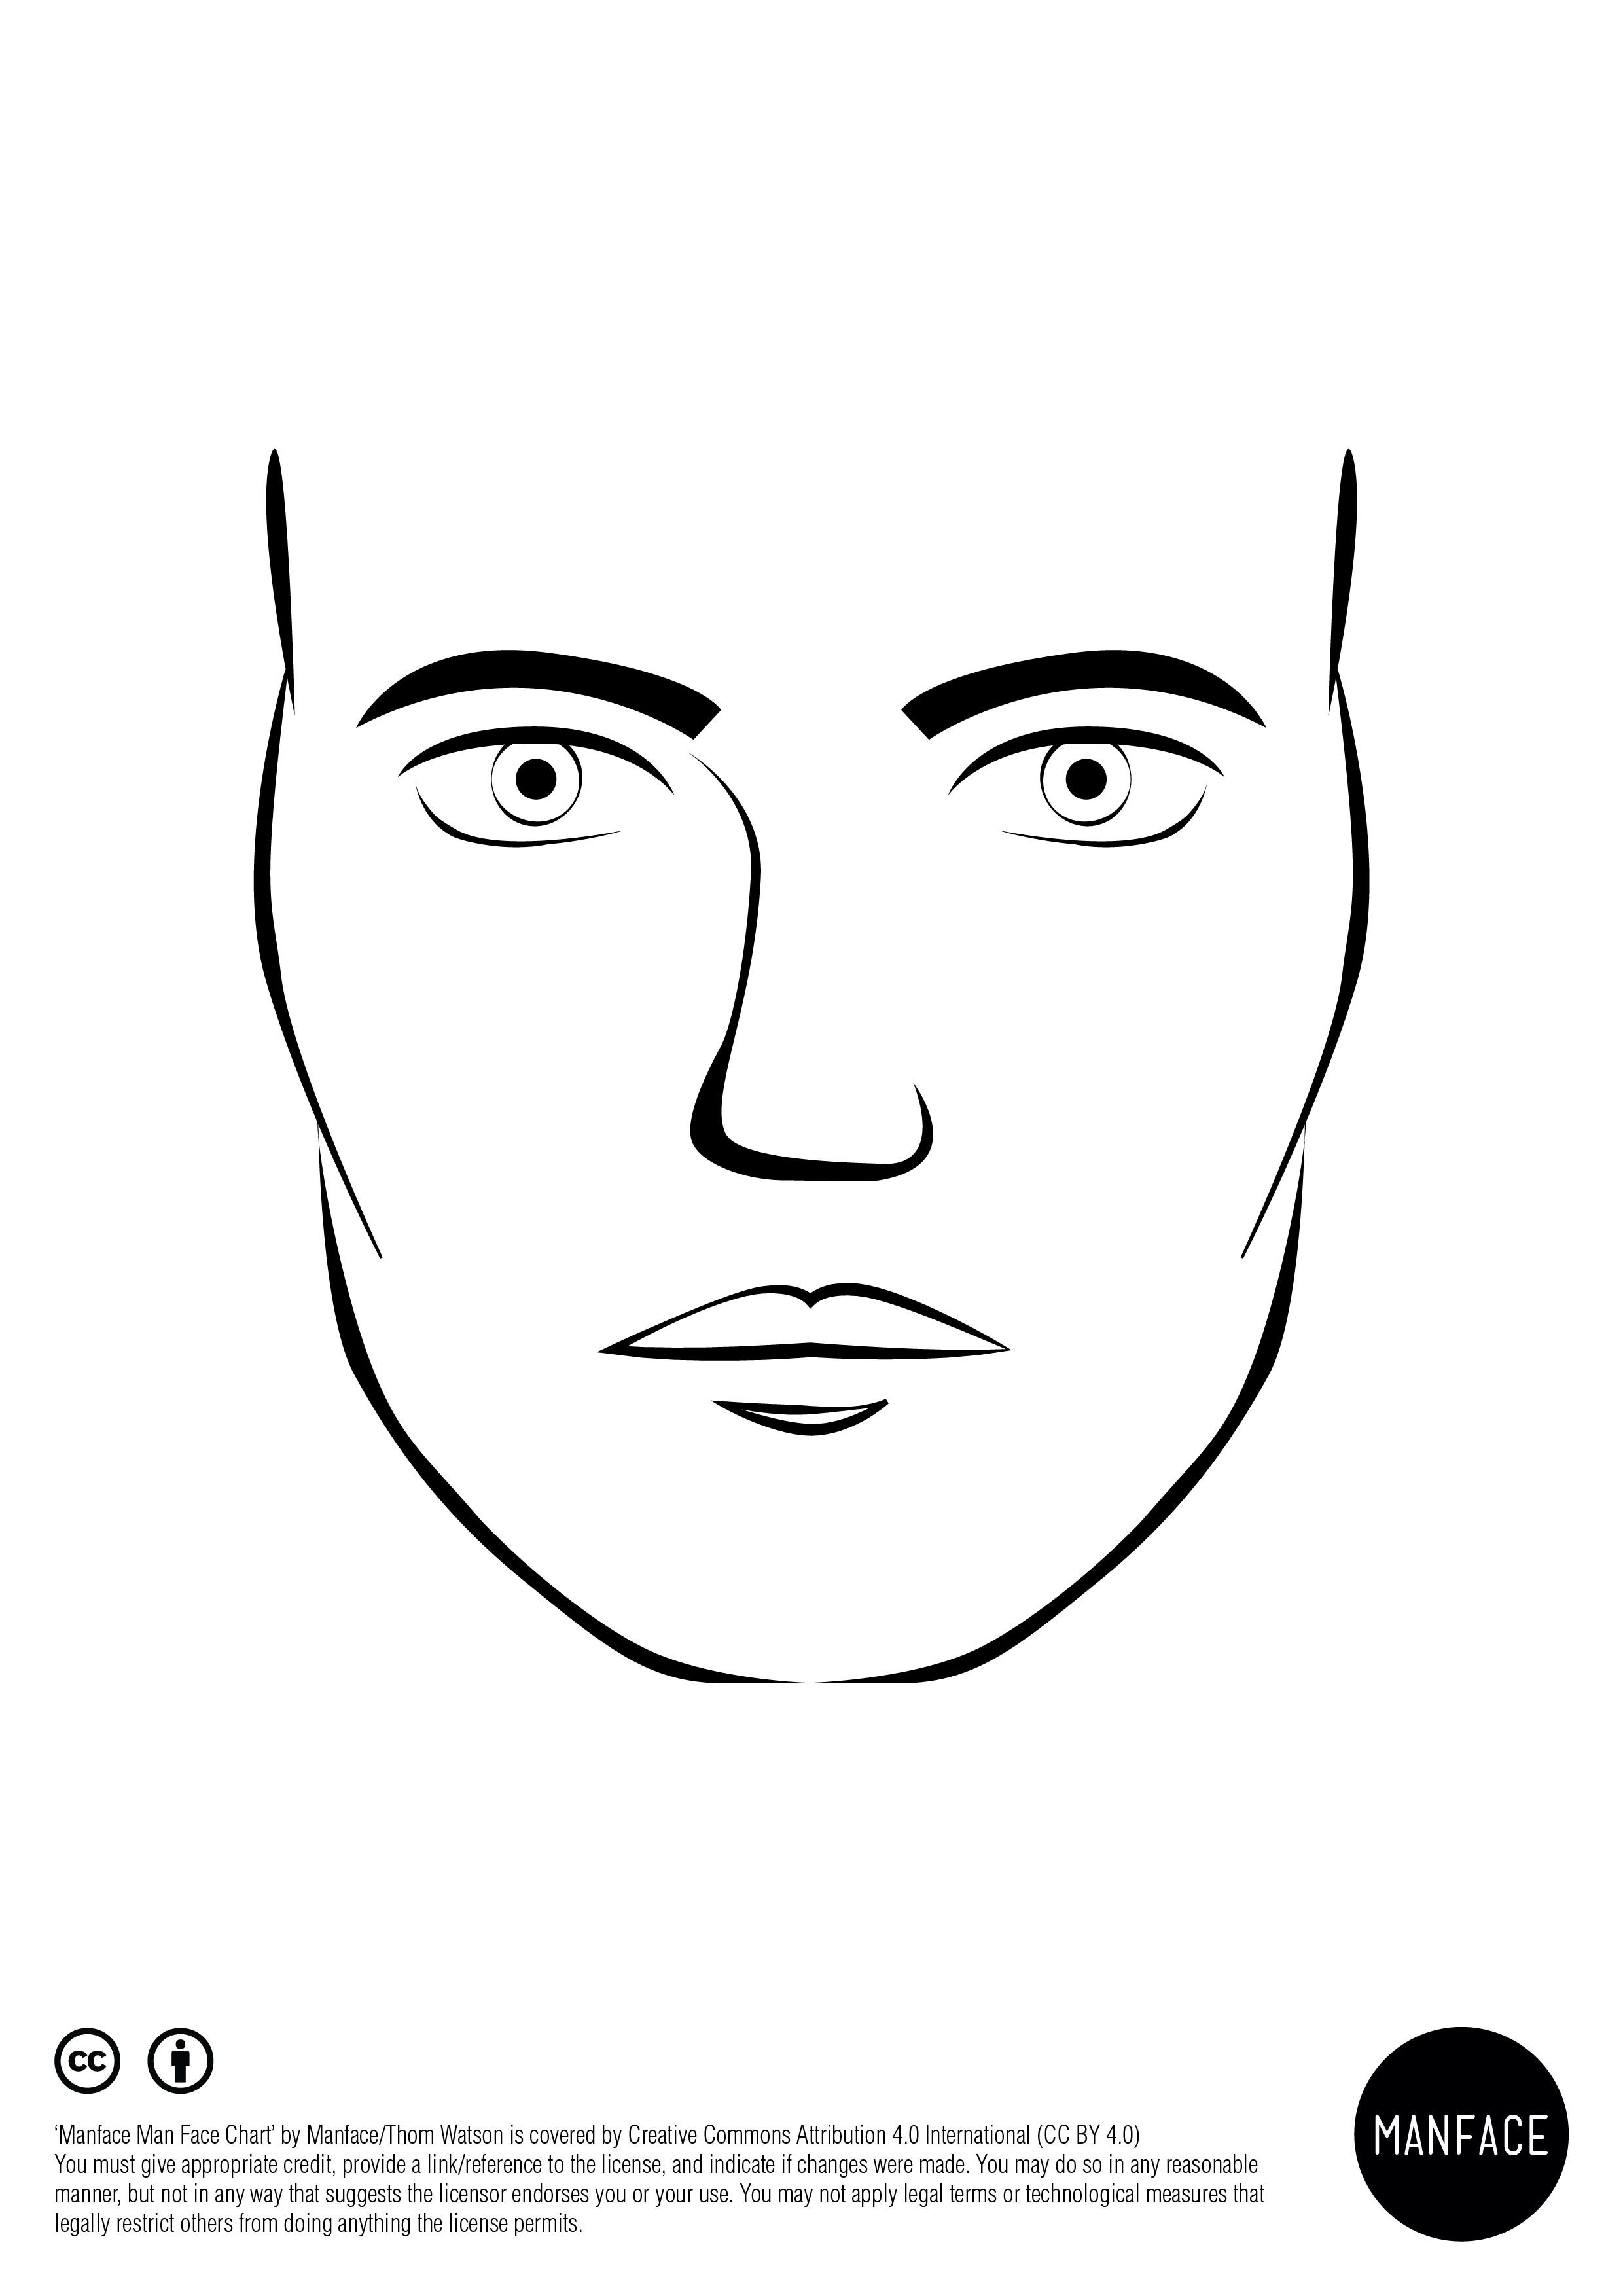 manface man face charts